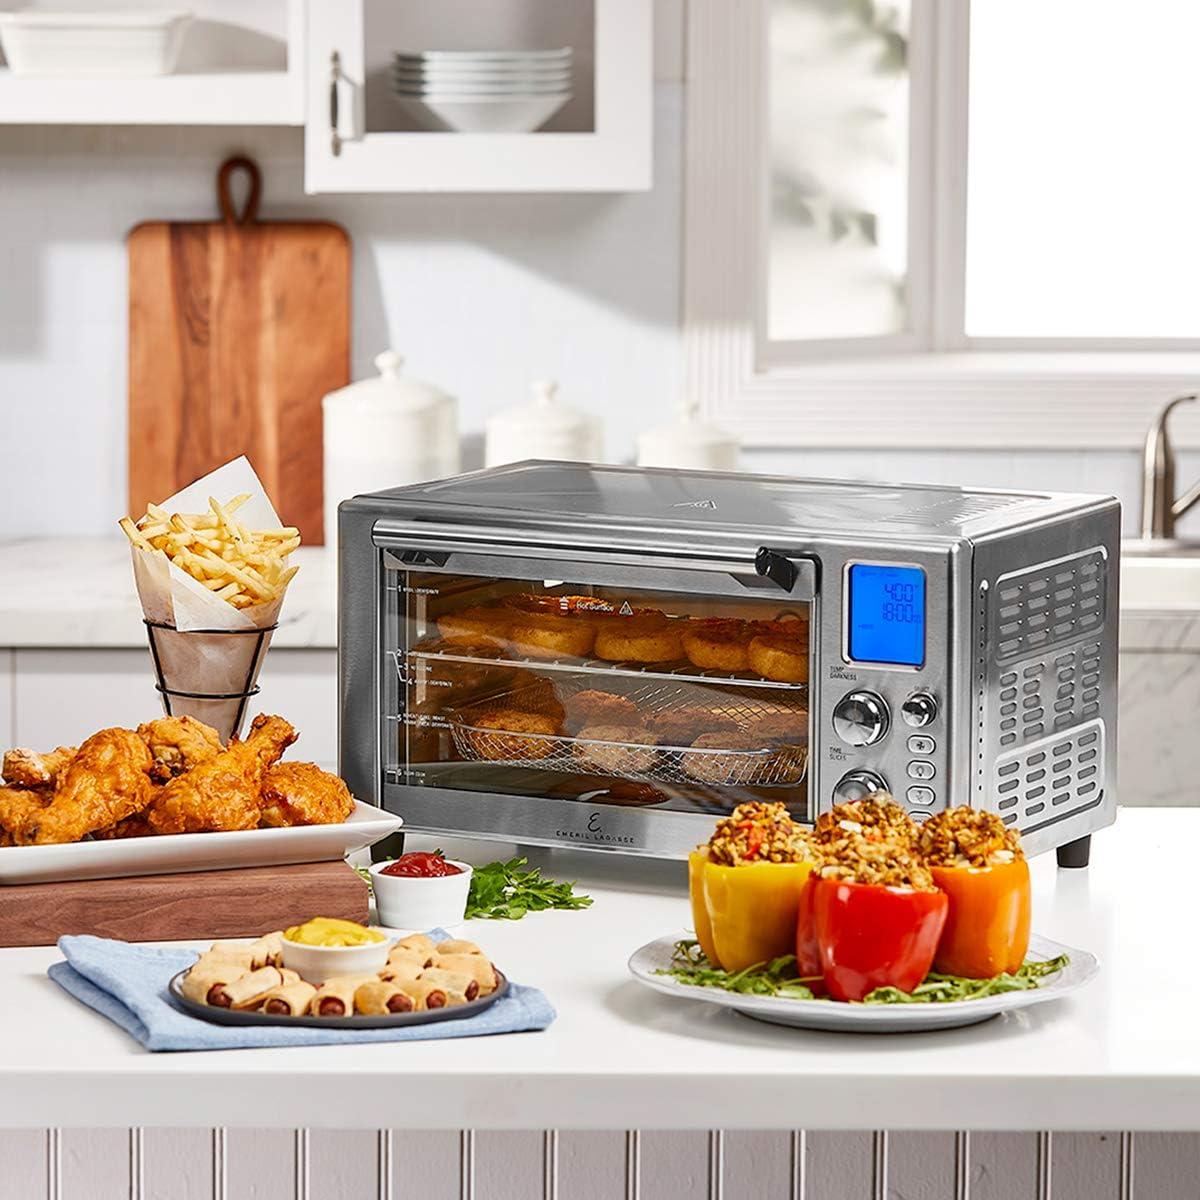 Amazon.com: Emeril Lagasse Power Freidora de aire horno 360 ...